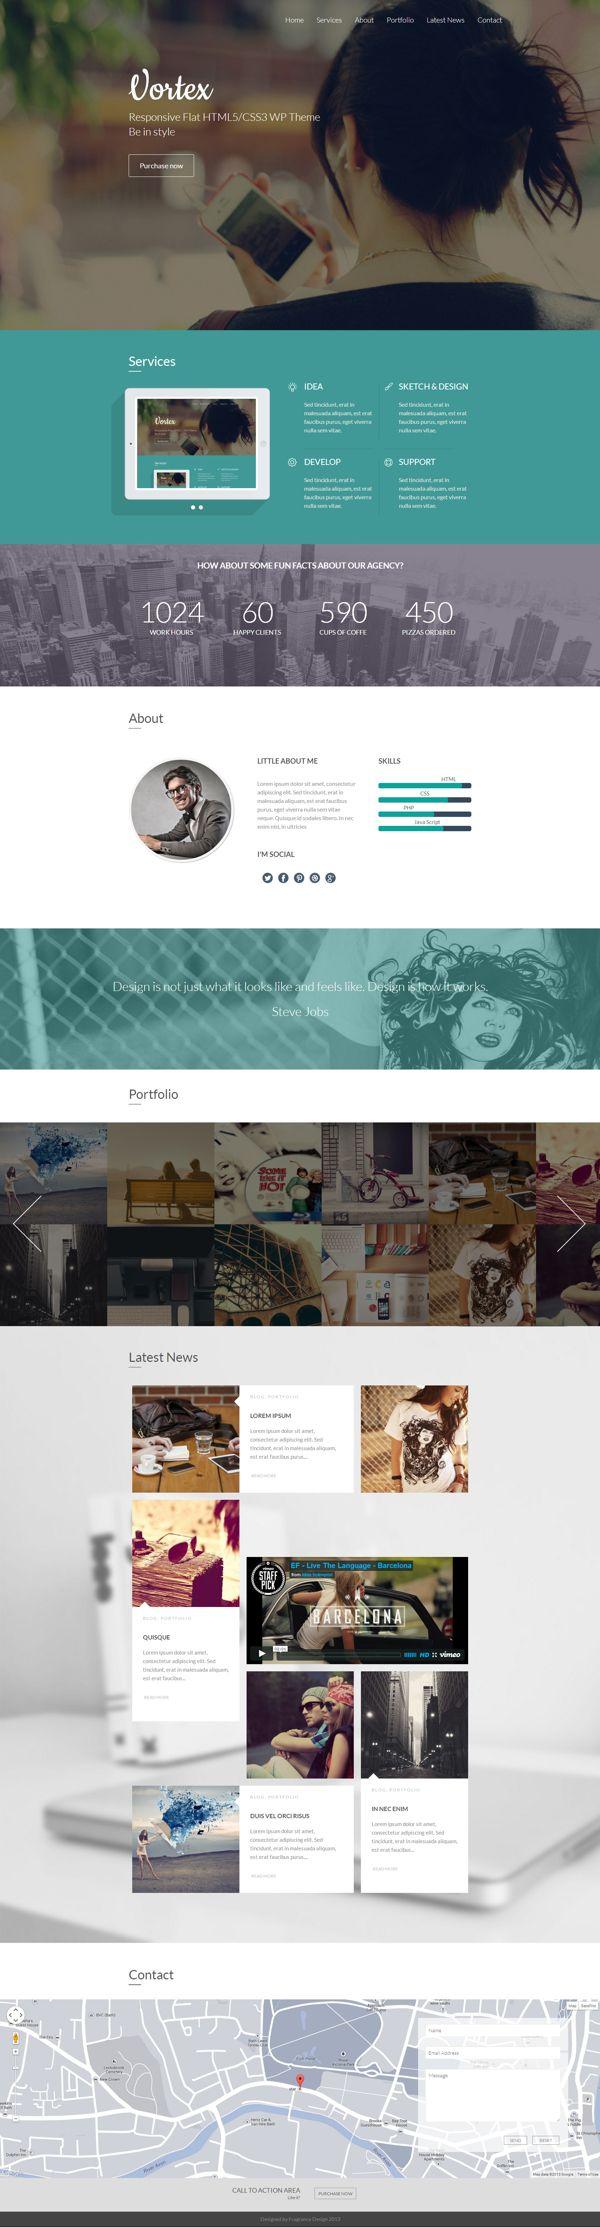 Vortex - One Page Parallax Flat WordPress Theme by Zizaza - design ocean , via Behance